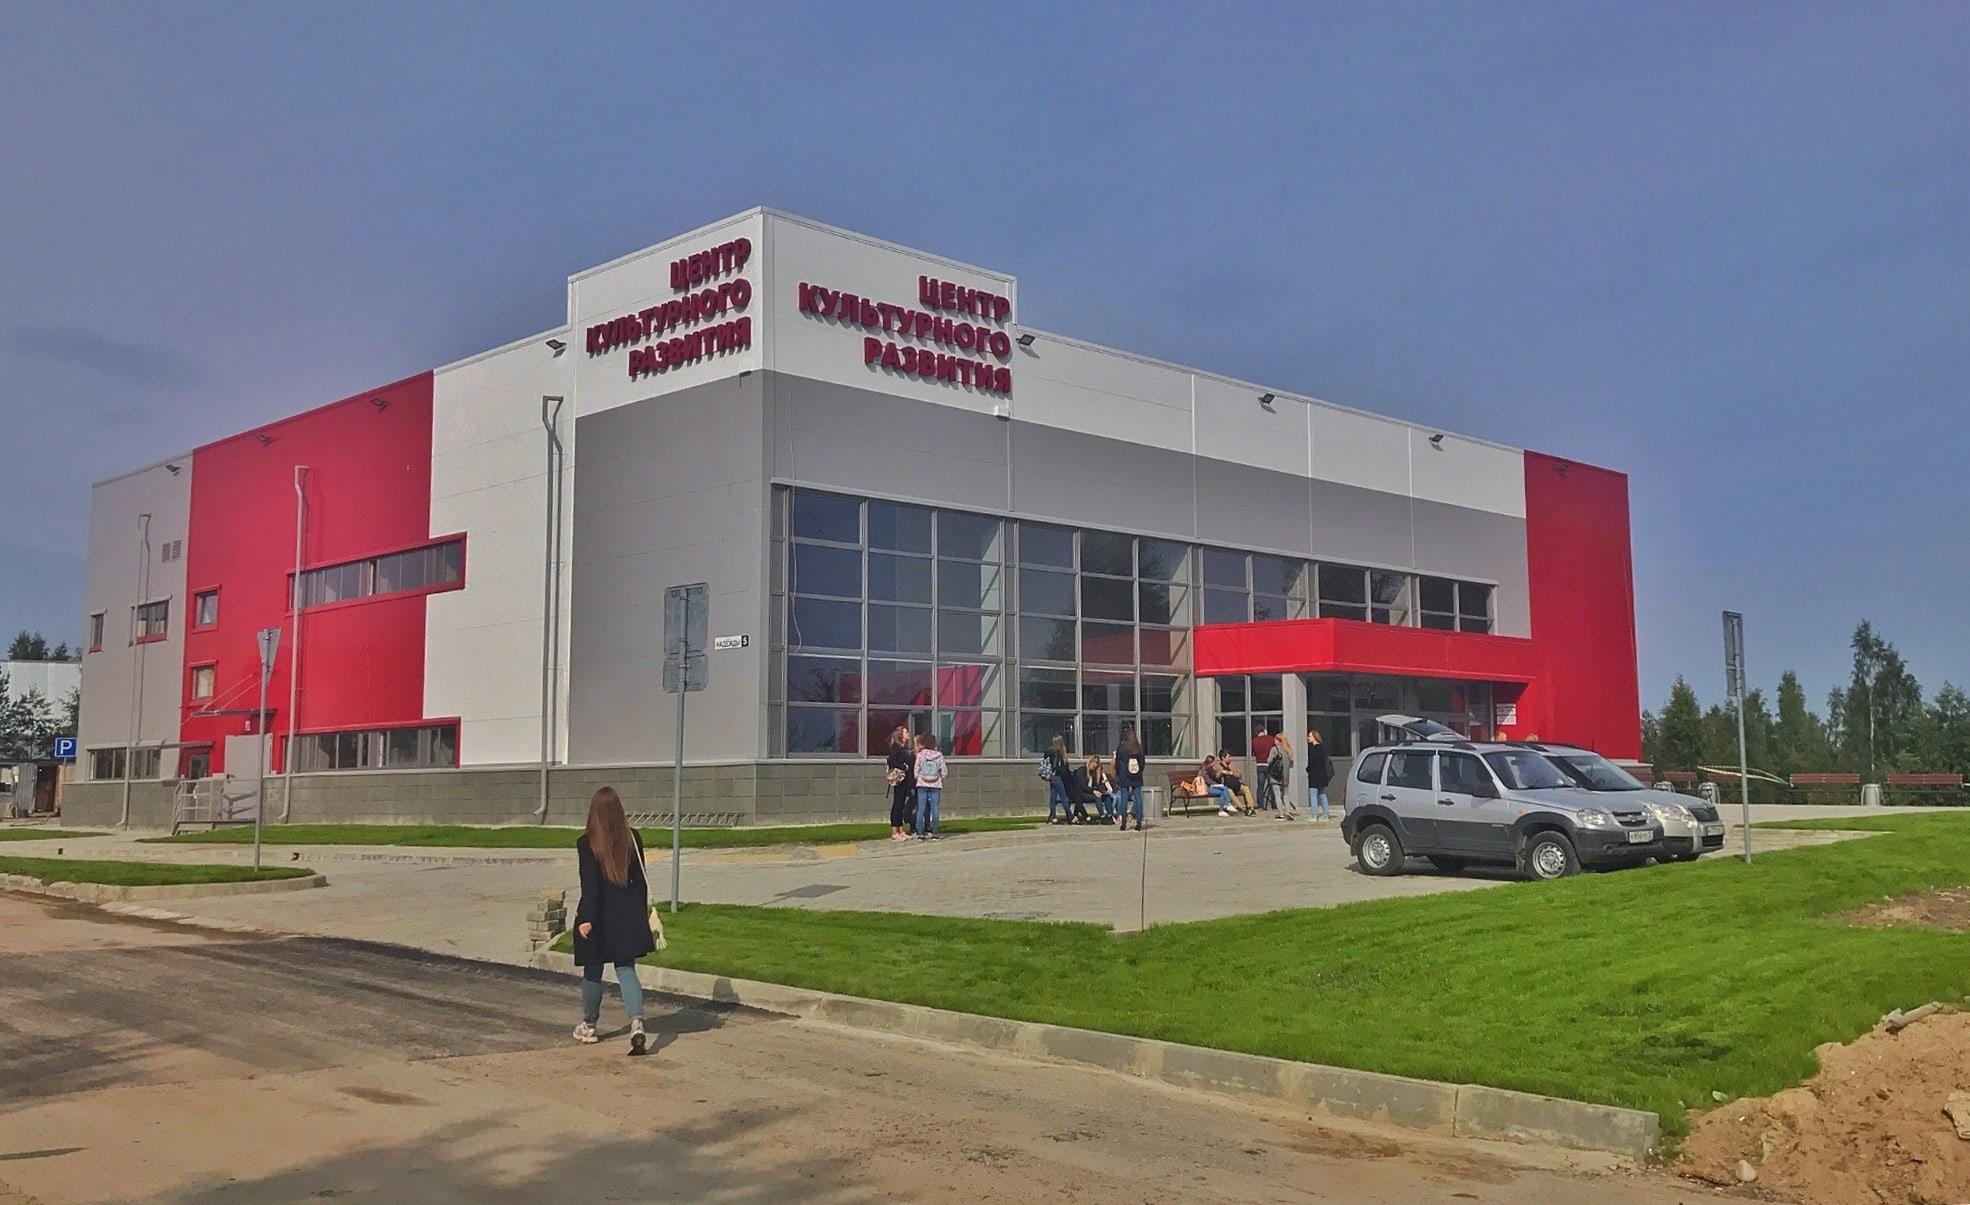 цкр центр культурного развития здание